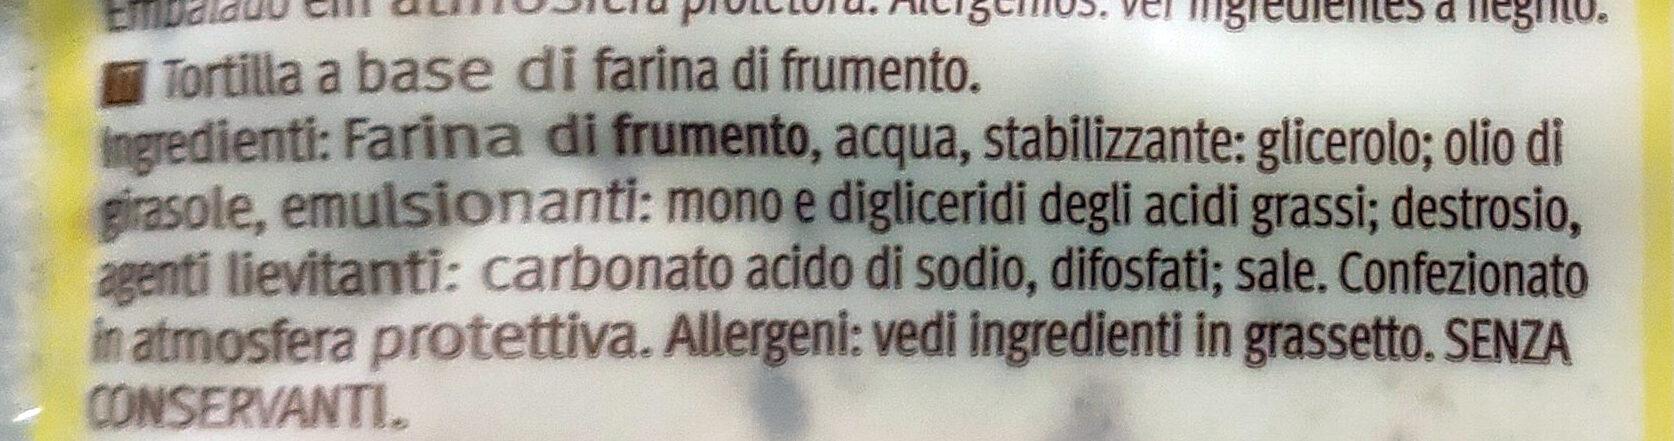 Tortillas trigo - Ingredienti - it